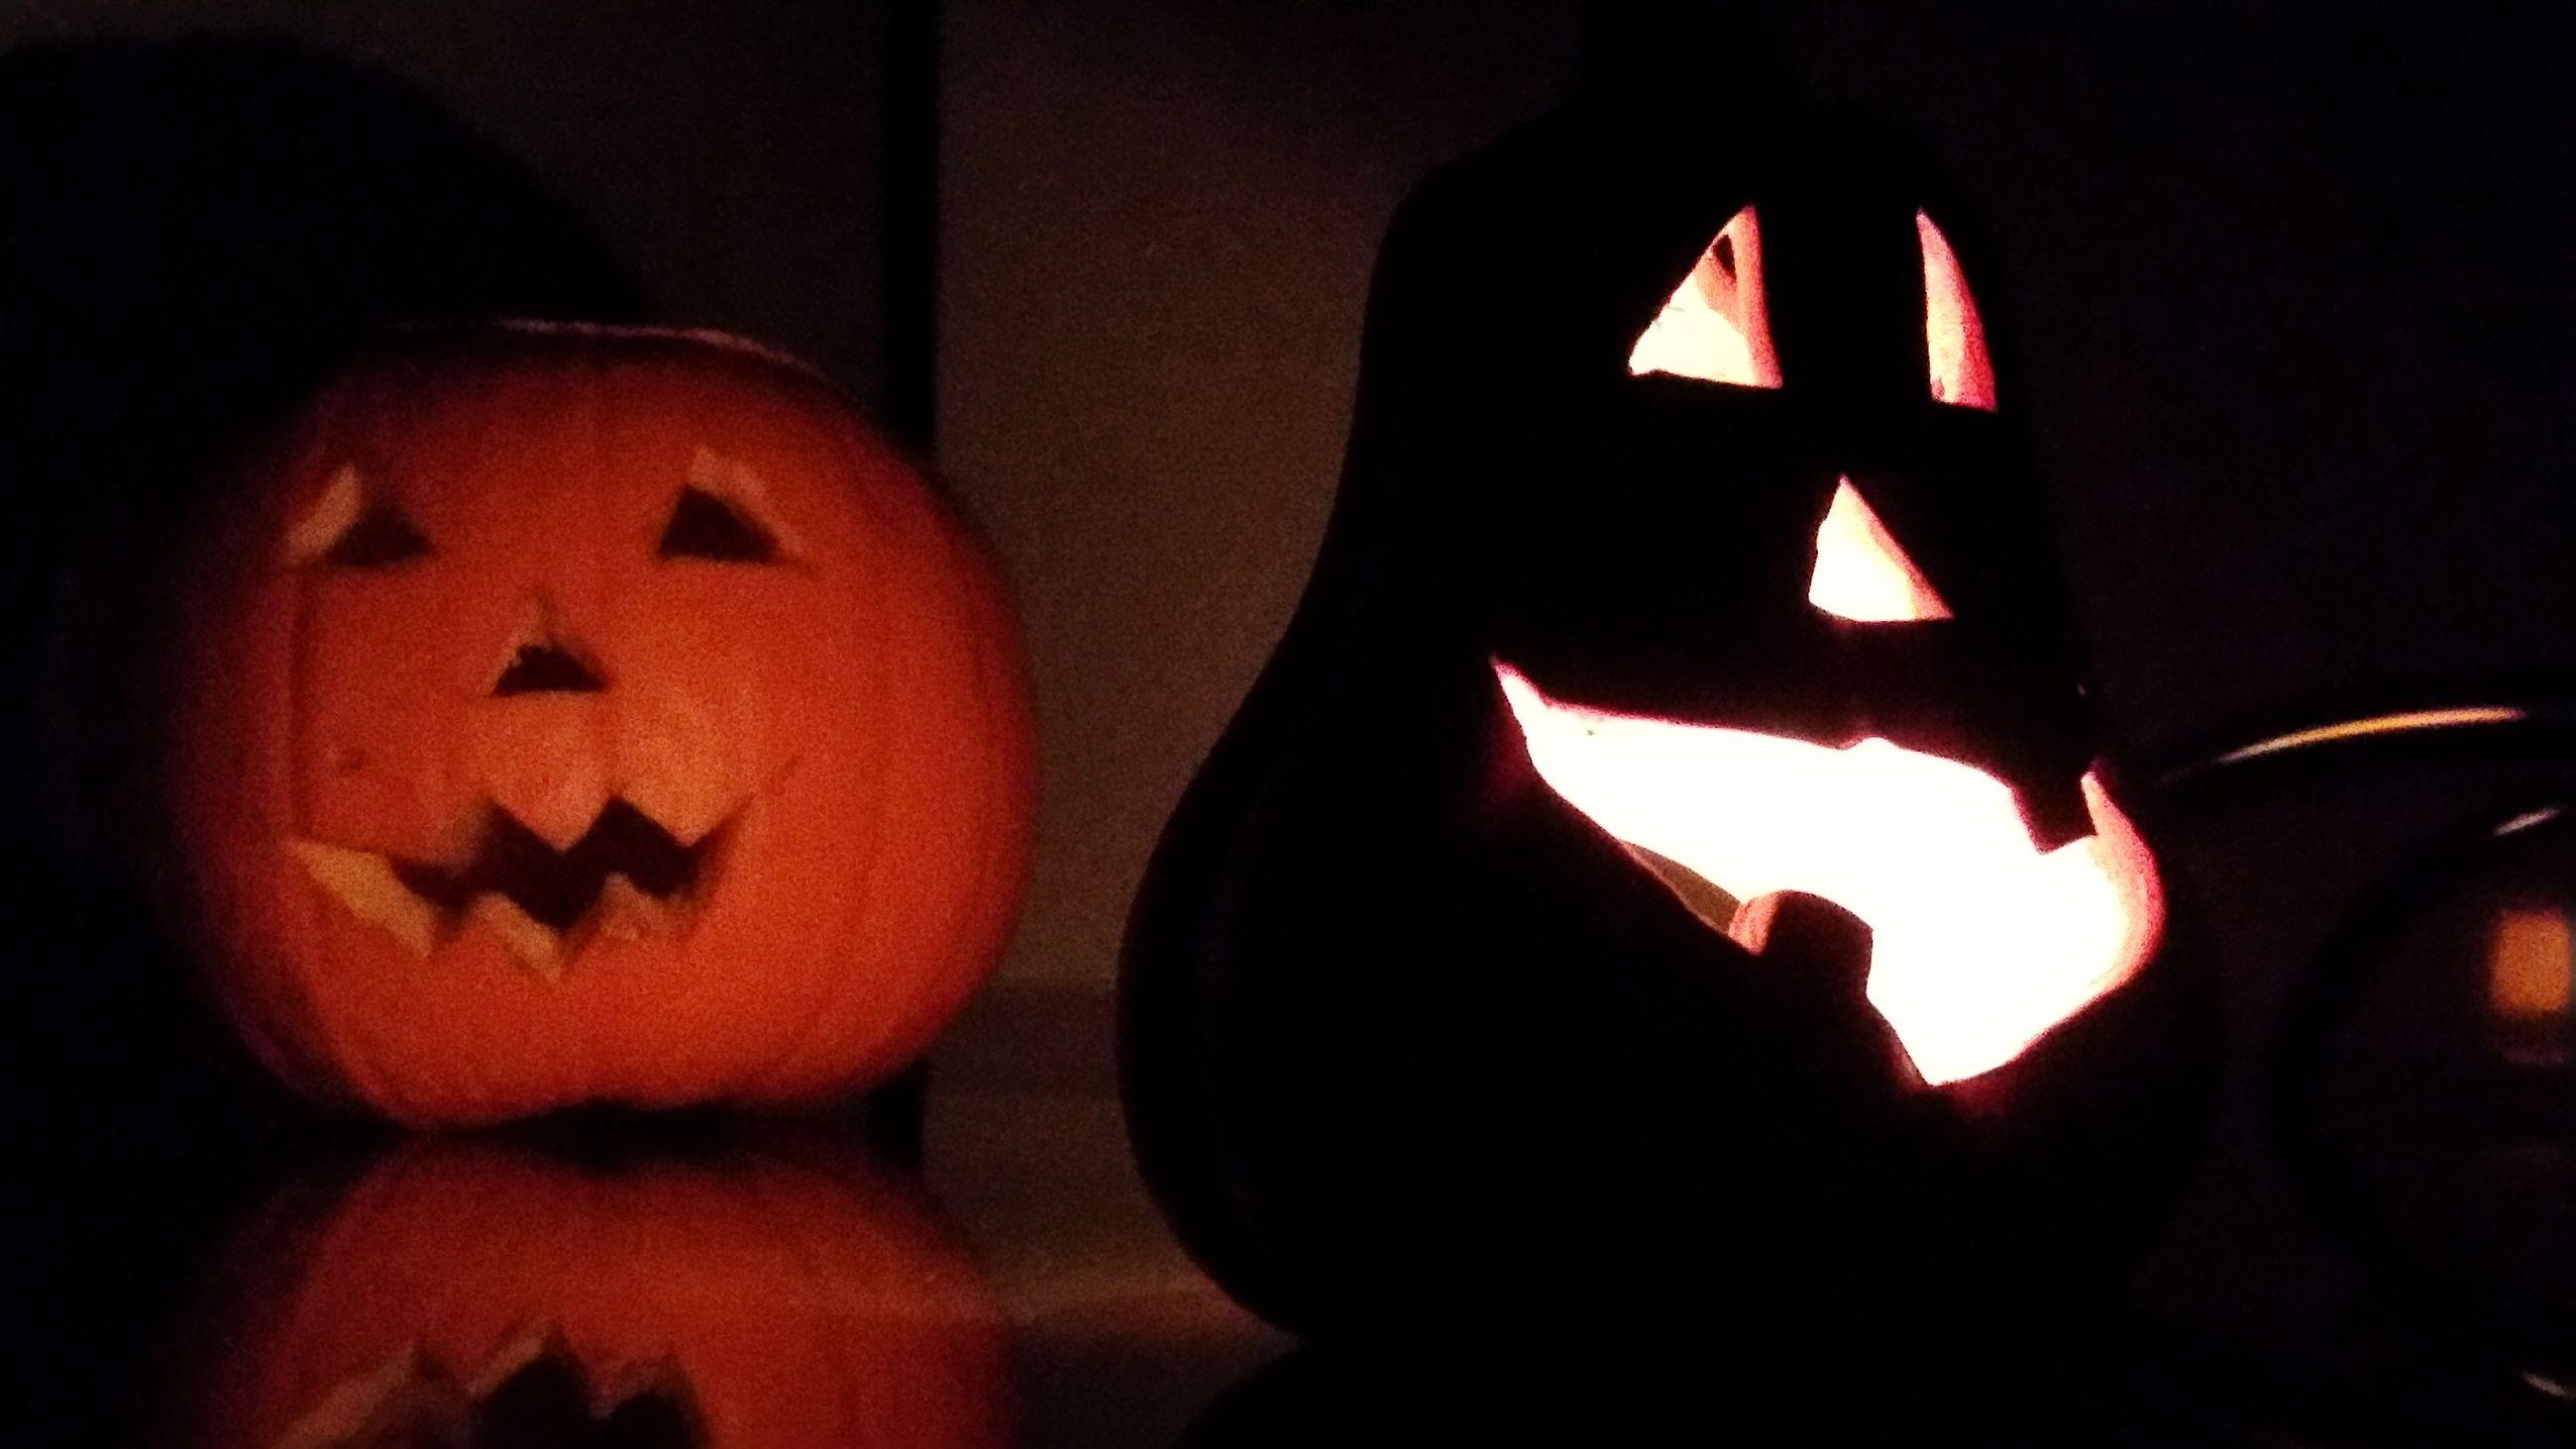 pumpkin, halloween, jack o lantern, anthropomorphic face, orange color, illuminated, celebration, cultures, spooky, tradition, no people, night, close-up, indoors